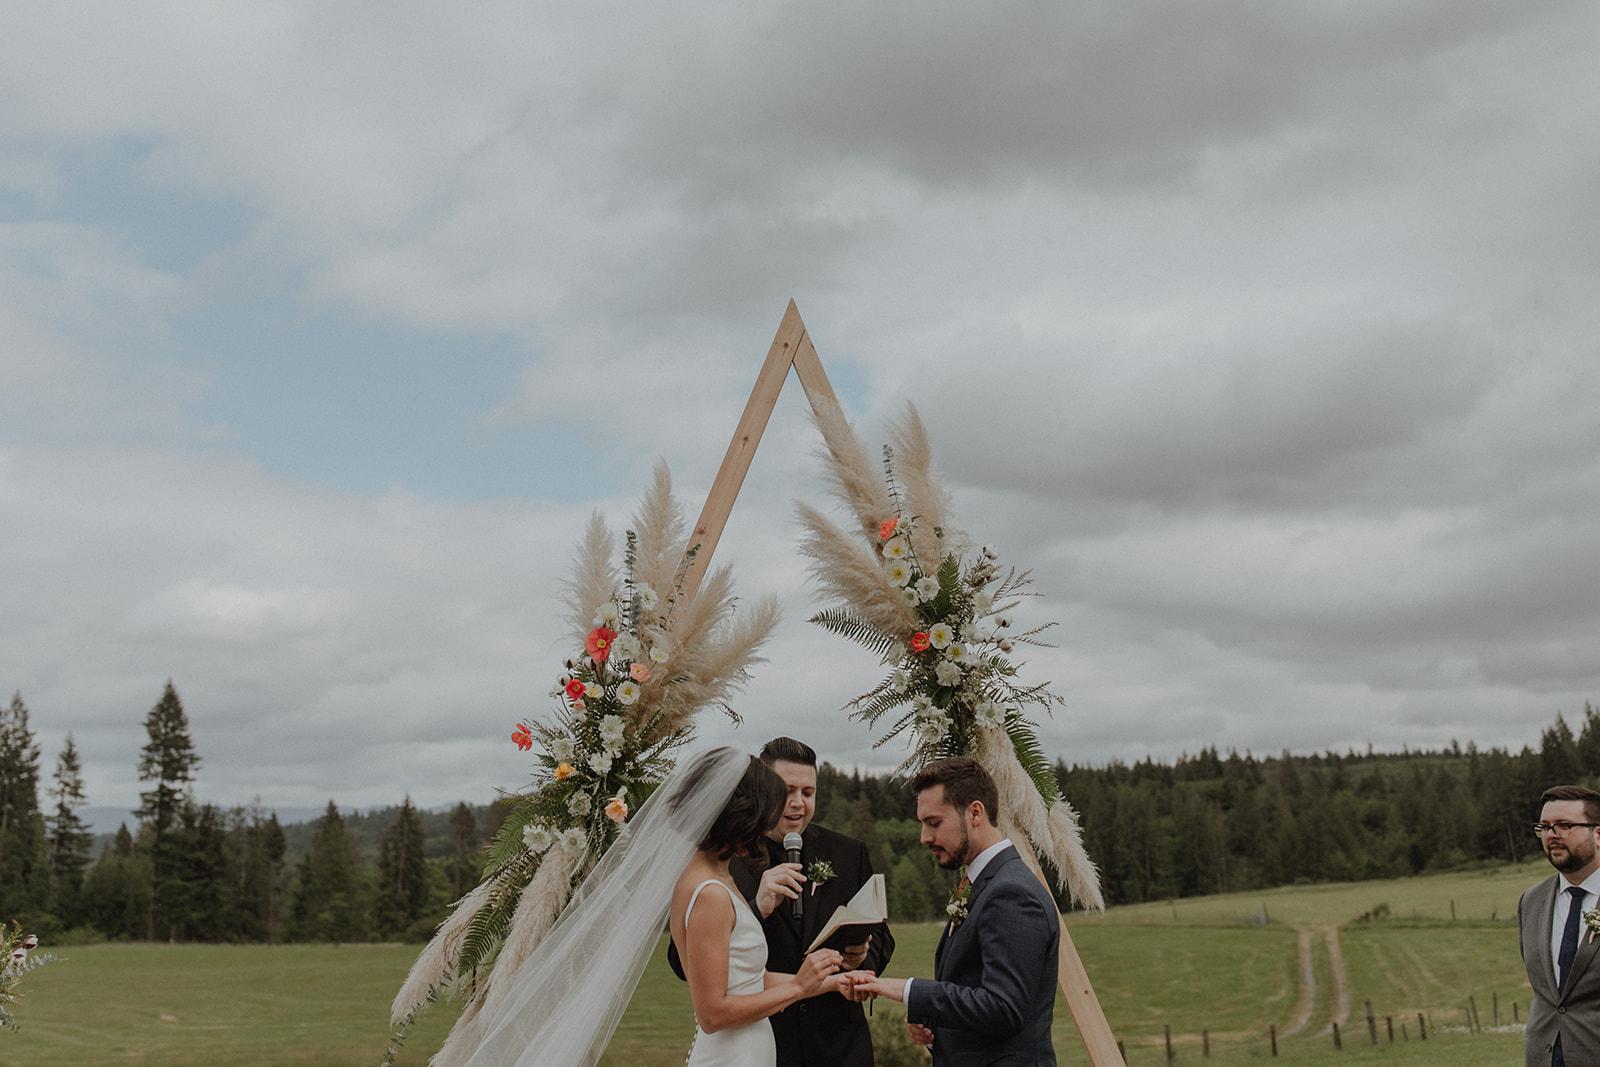 cortney_skye_wedding_june2019-416.jpg